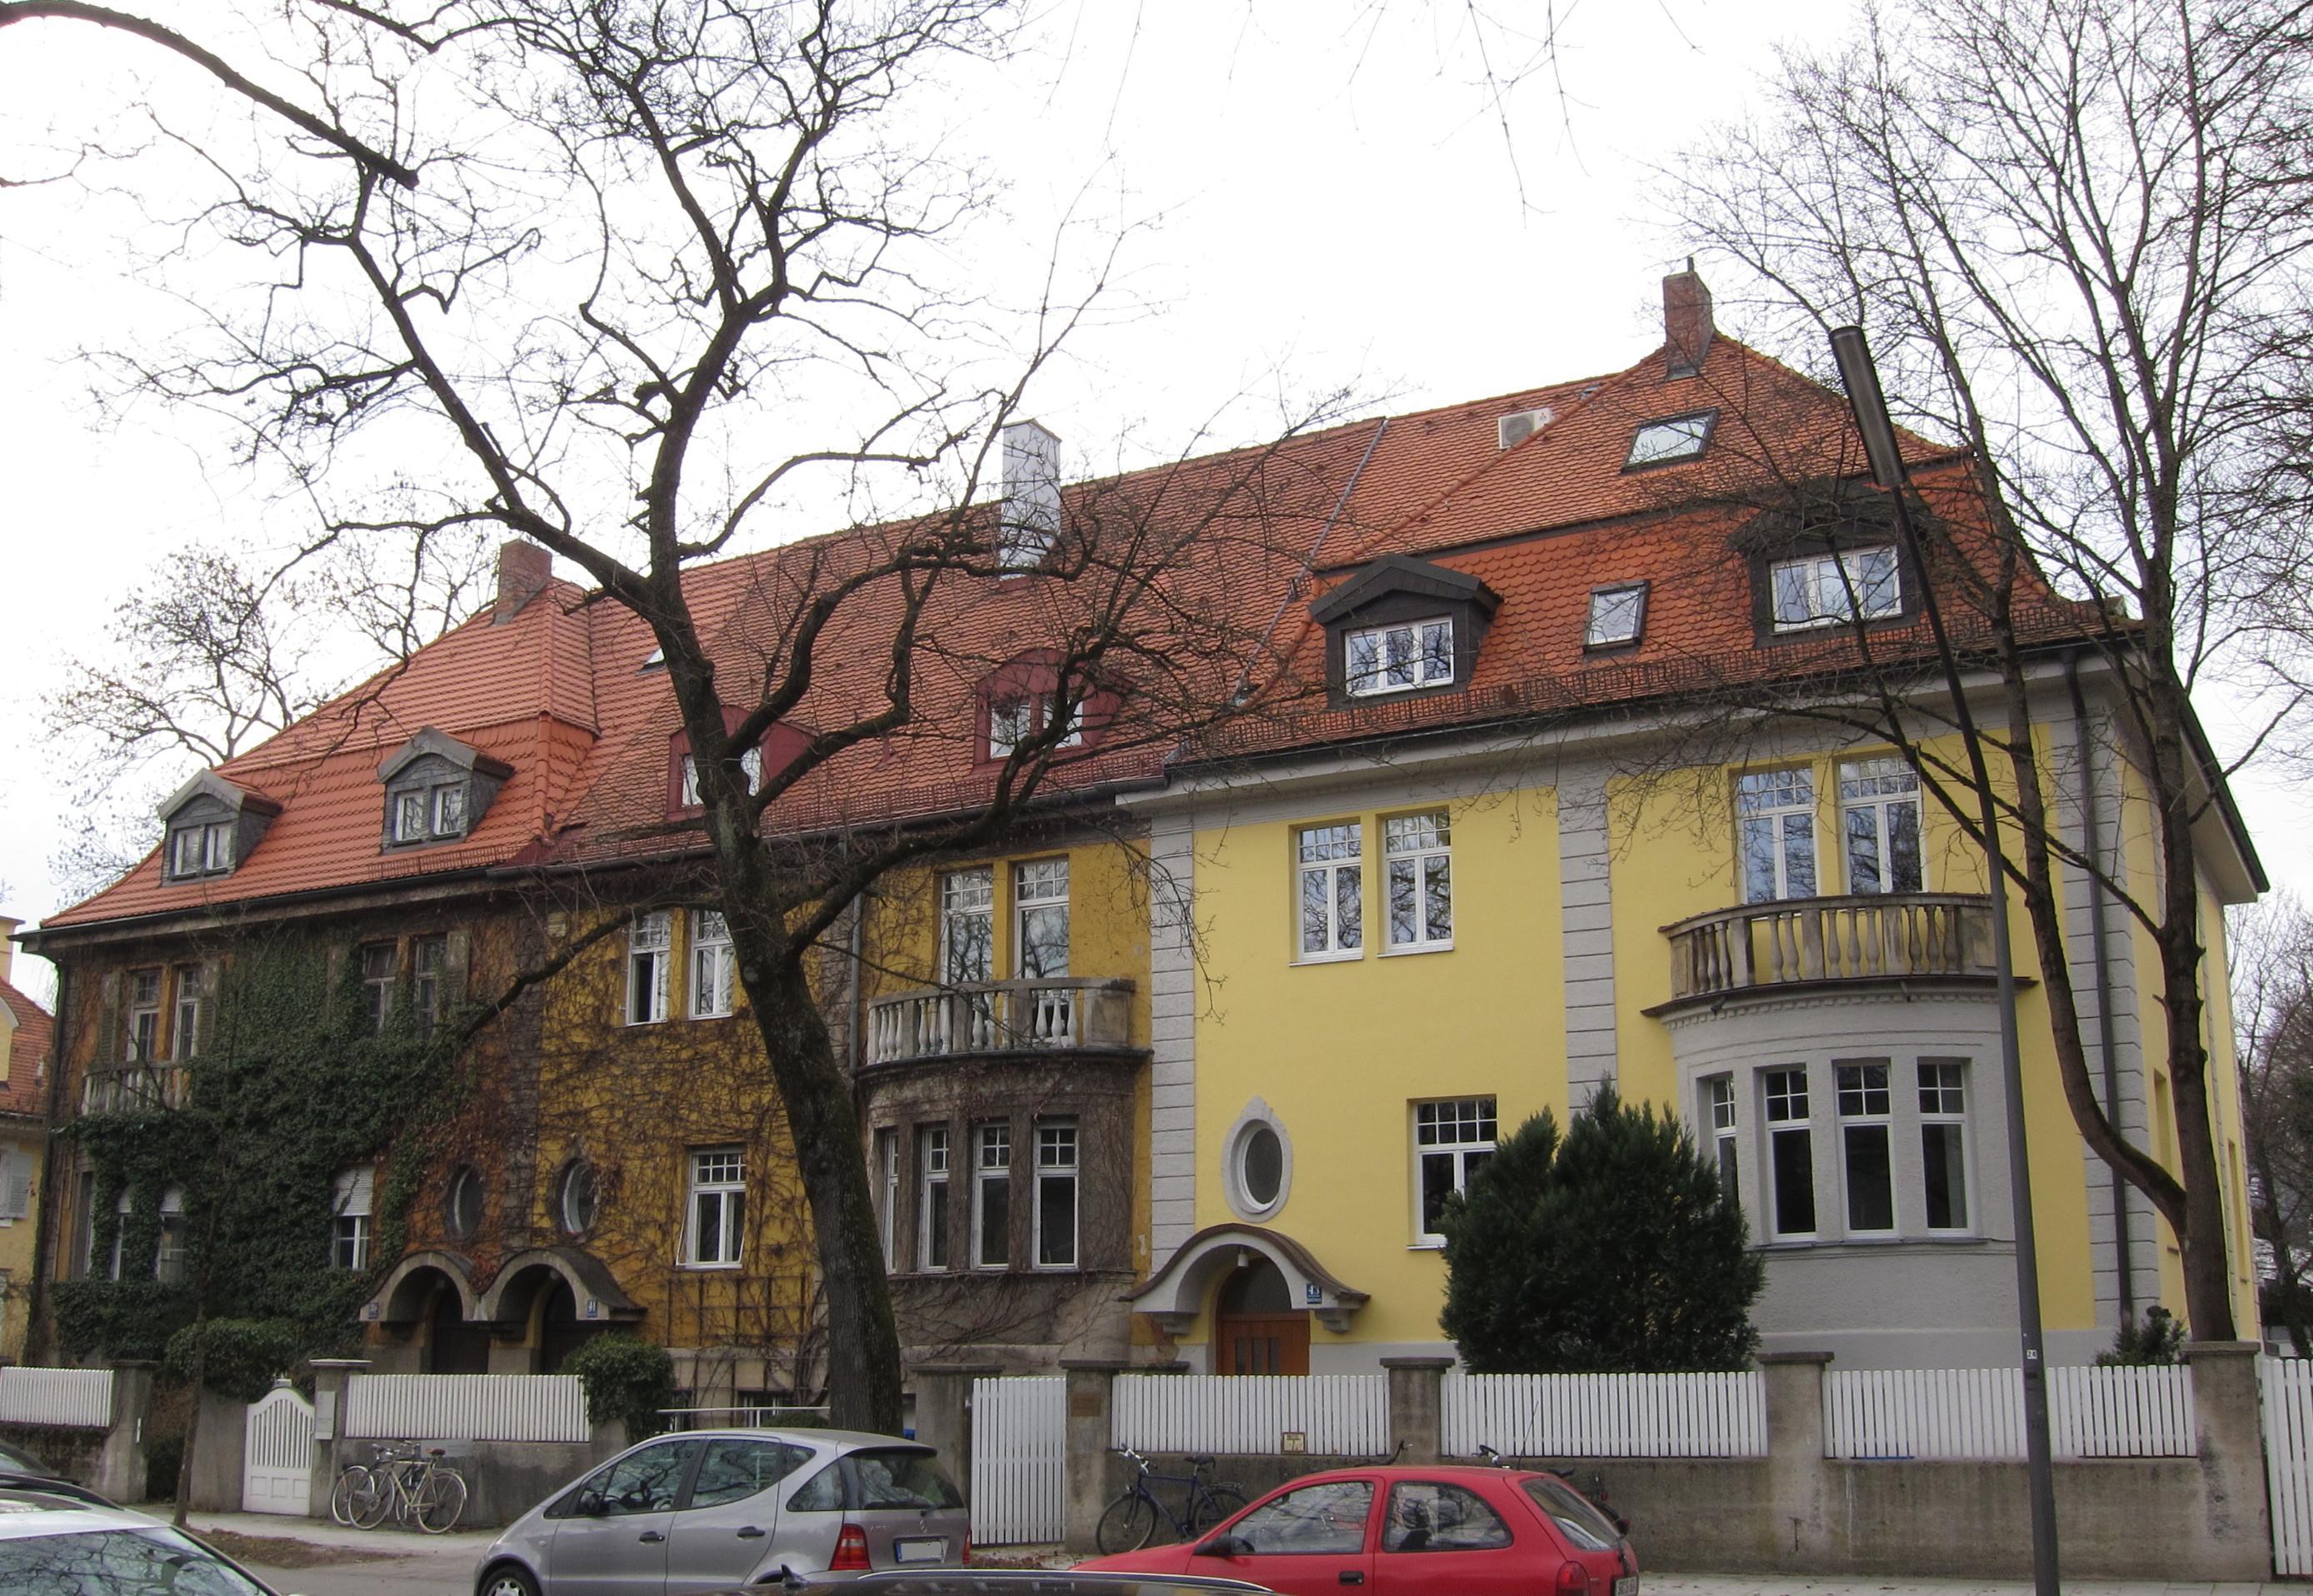 Mauerkircherstr München file mauerkircherstr 43 muenchen 02 jpg wikimedia commons